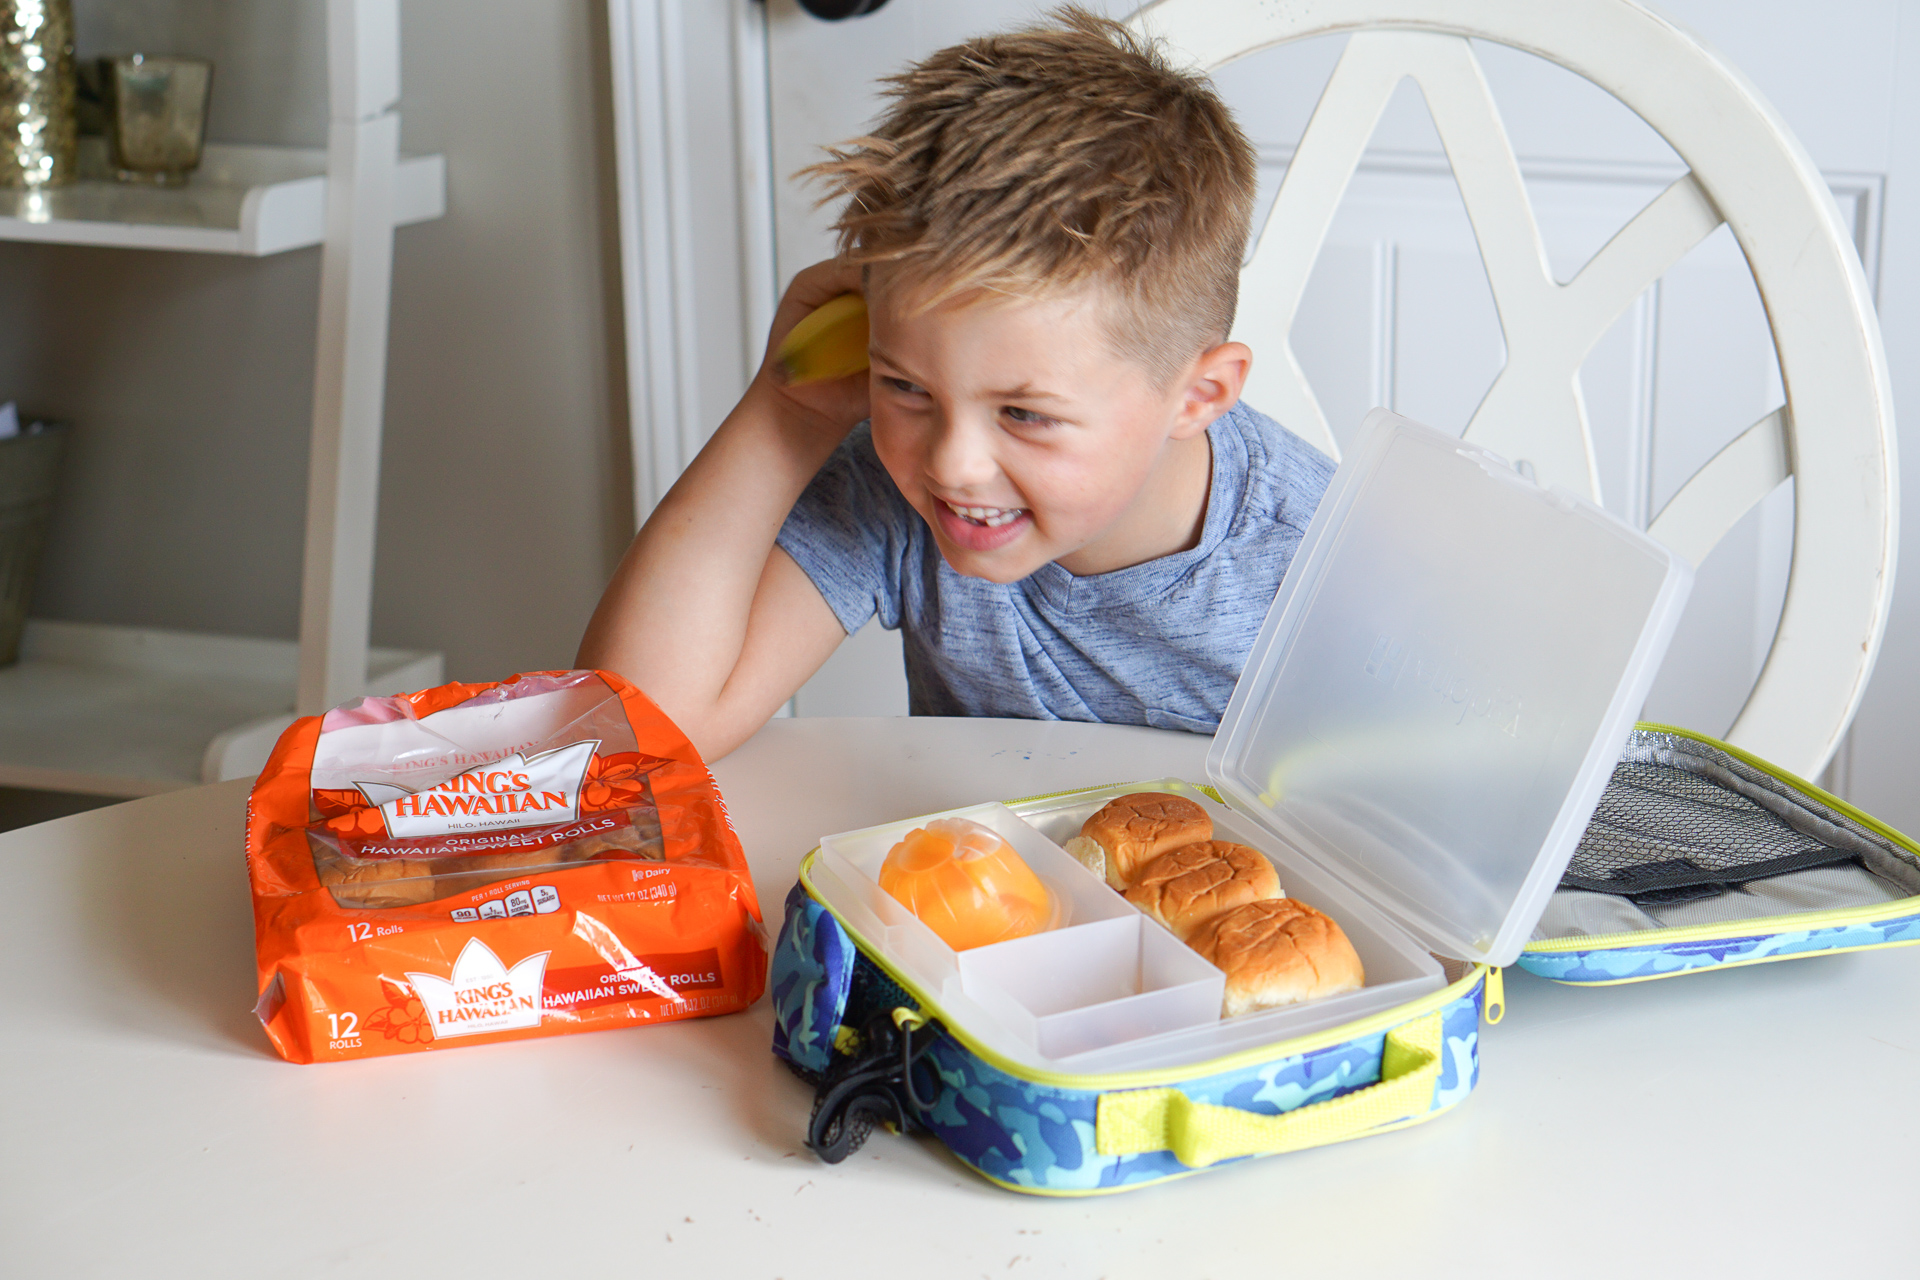 Lunch Box Ideas for Back to School - King's Hawaiian Bread Rolls Recipe @frostedevents